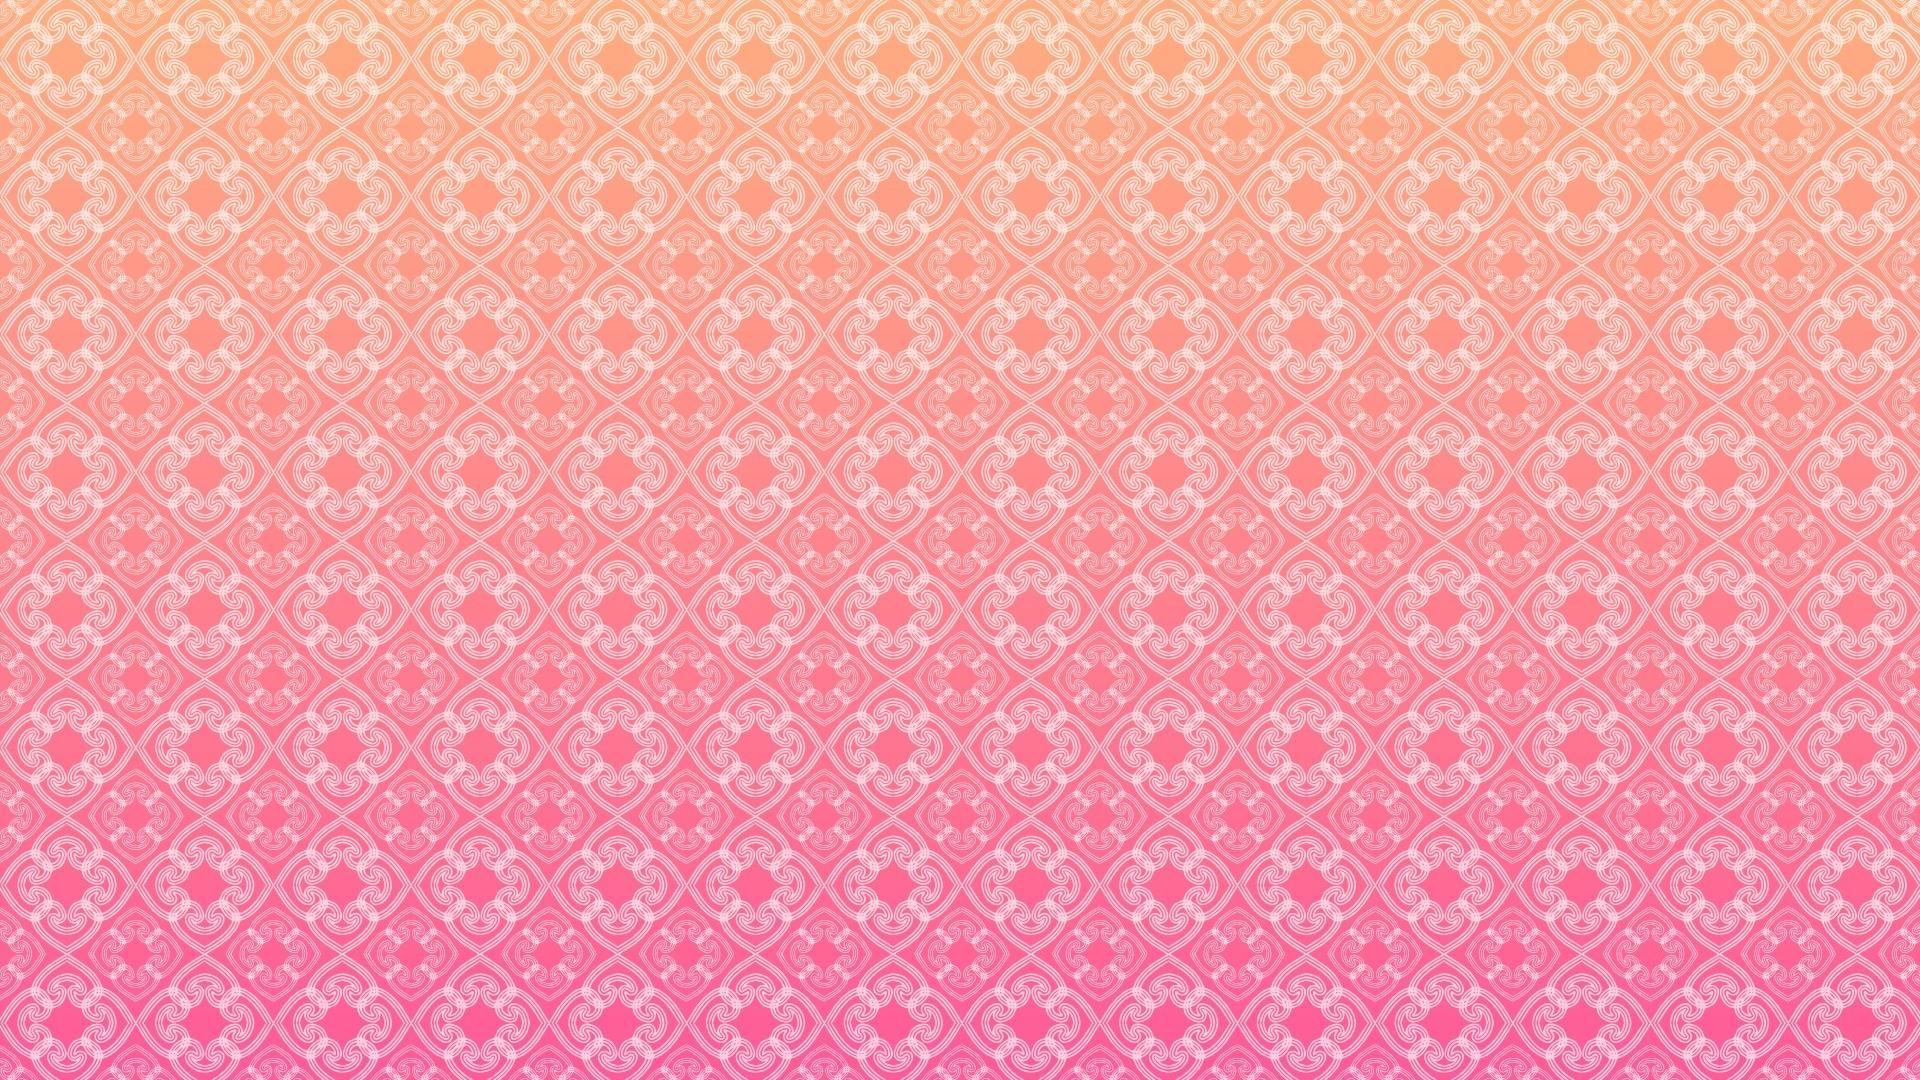 Pink Wallpapers Tumblr 009